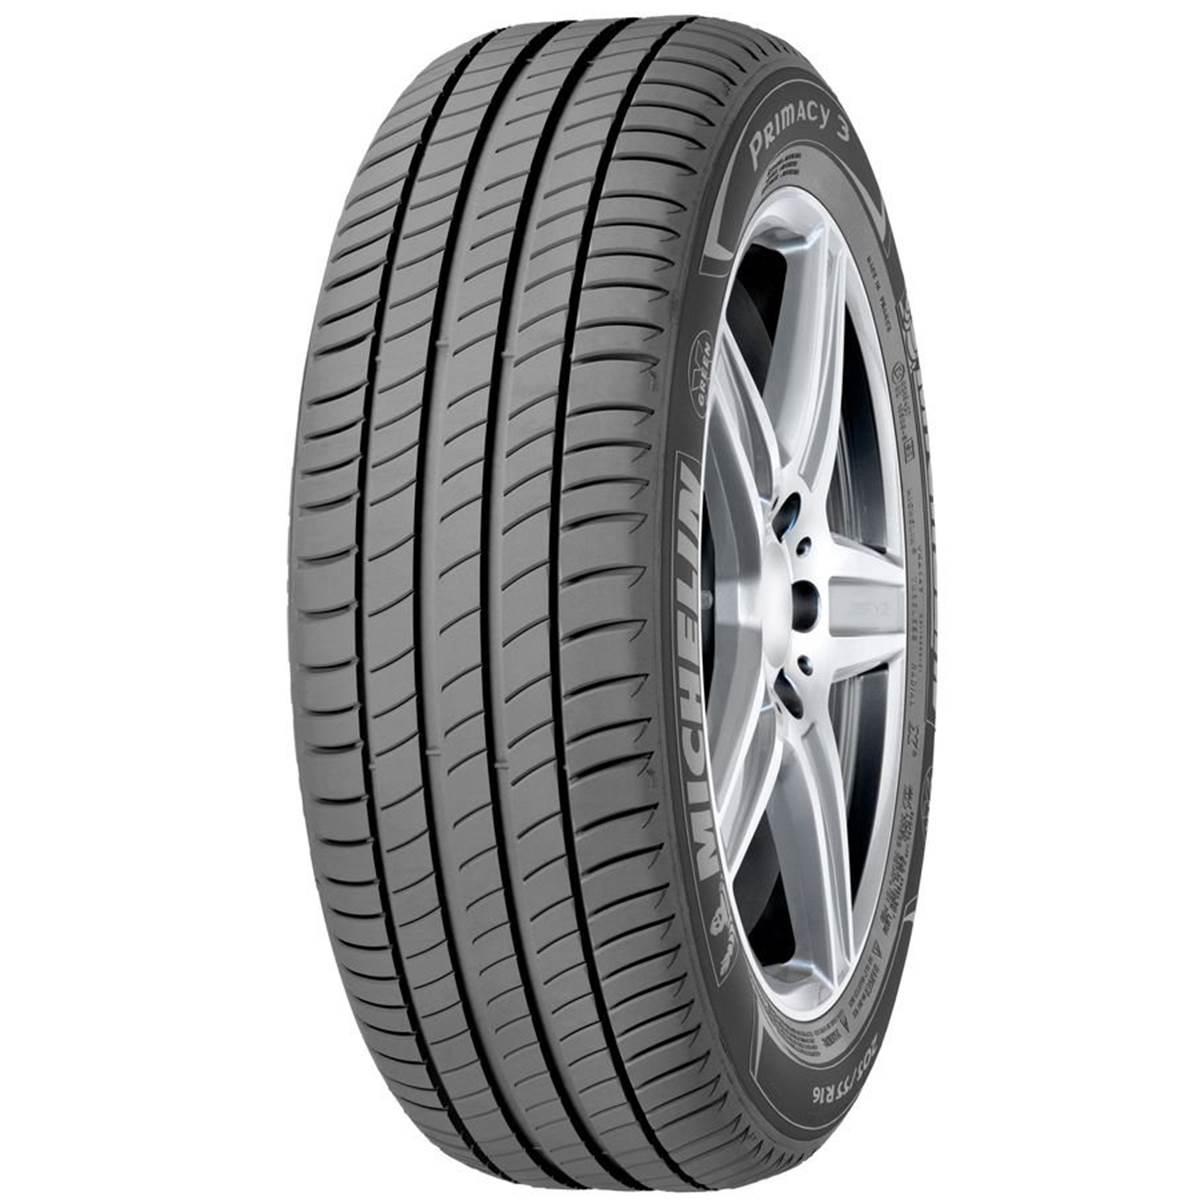 Pneu Michelin 215/55R17 94W Primacy 3